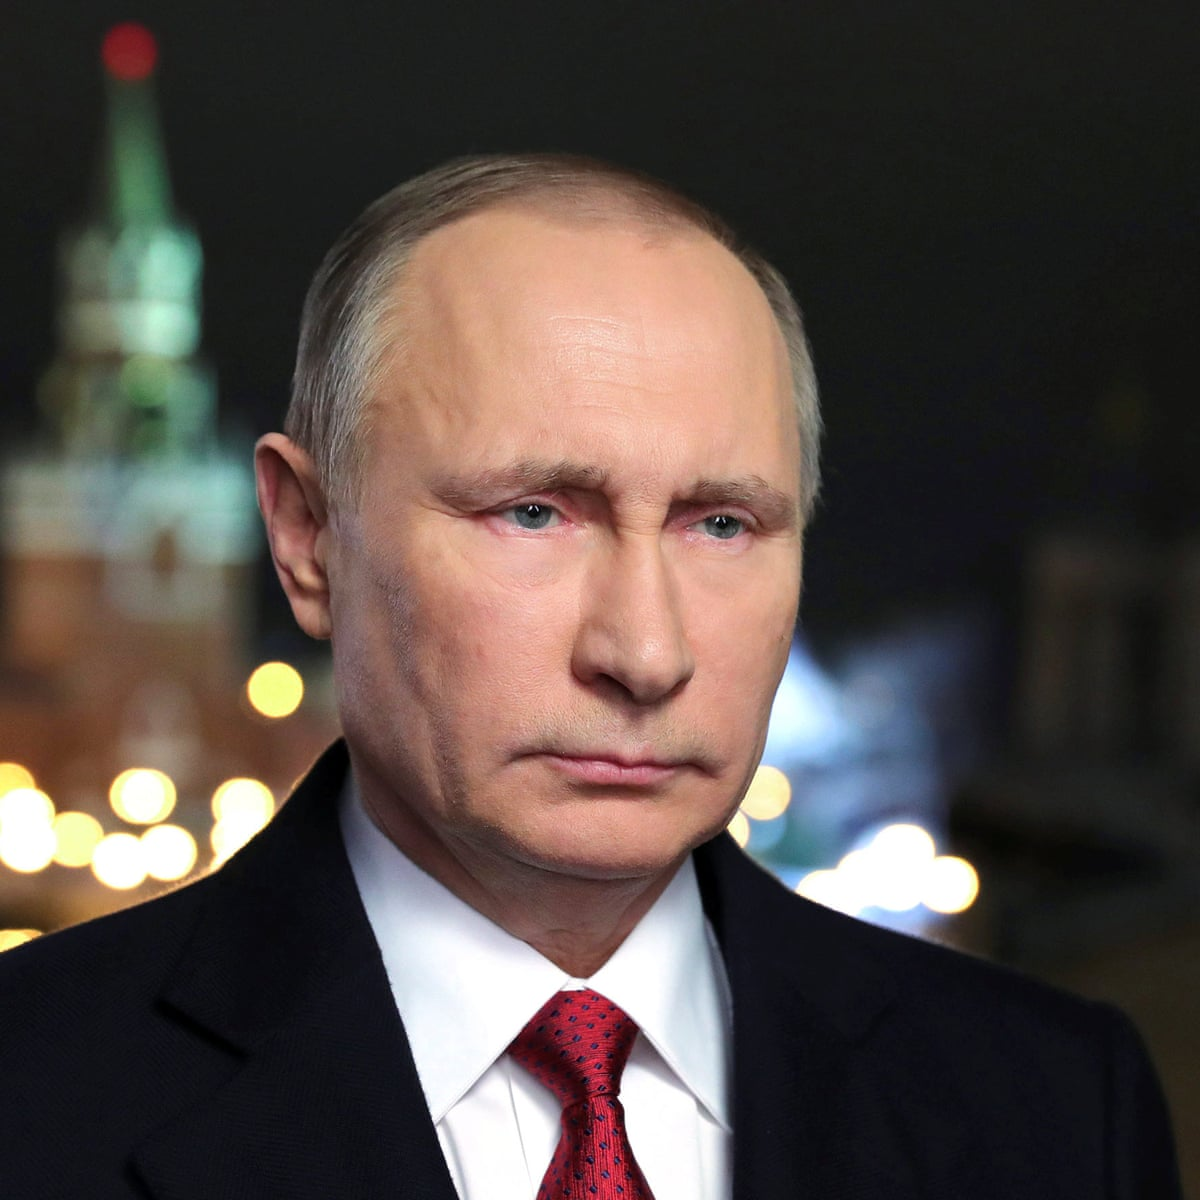 Vladimir Putin Behold The Other Man Of The Moment Vladimir Putin The Guardian